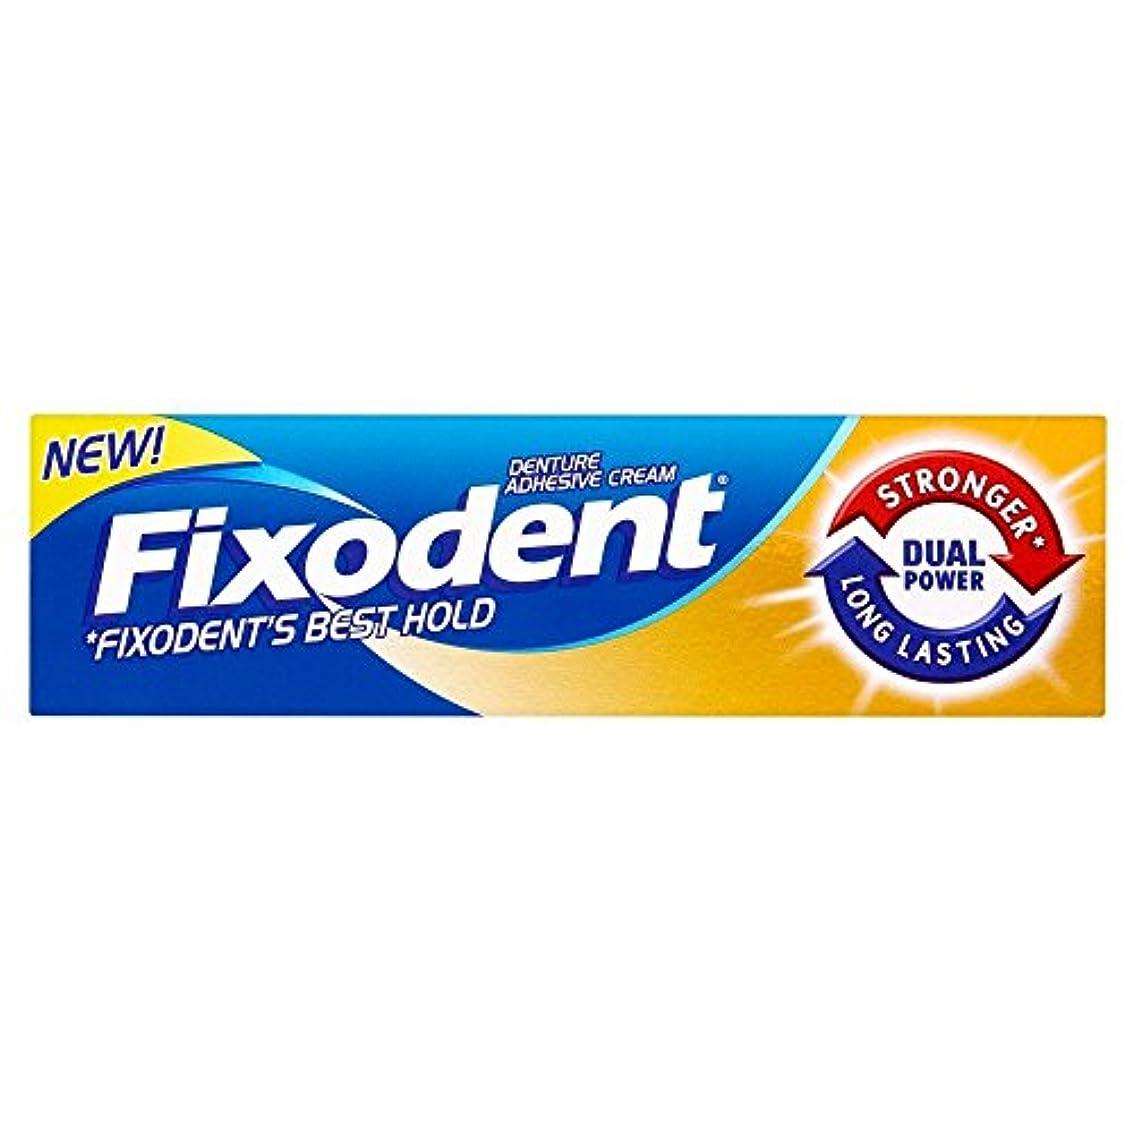 Fixodent Denture Adhesive Cream Dual Power (35ml) Fixodent義歯接着剤クリームデュアルパワー( 35ミリリットル) [並行輸入品]